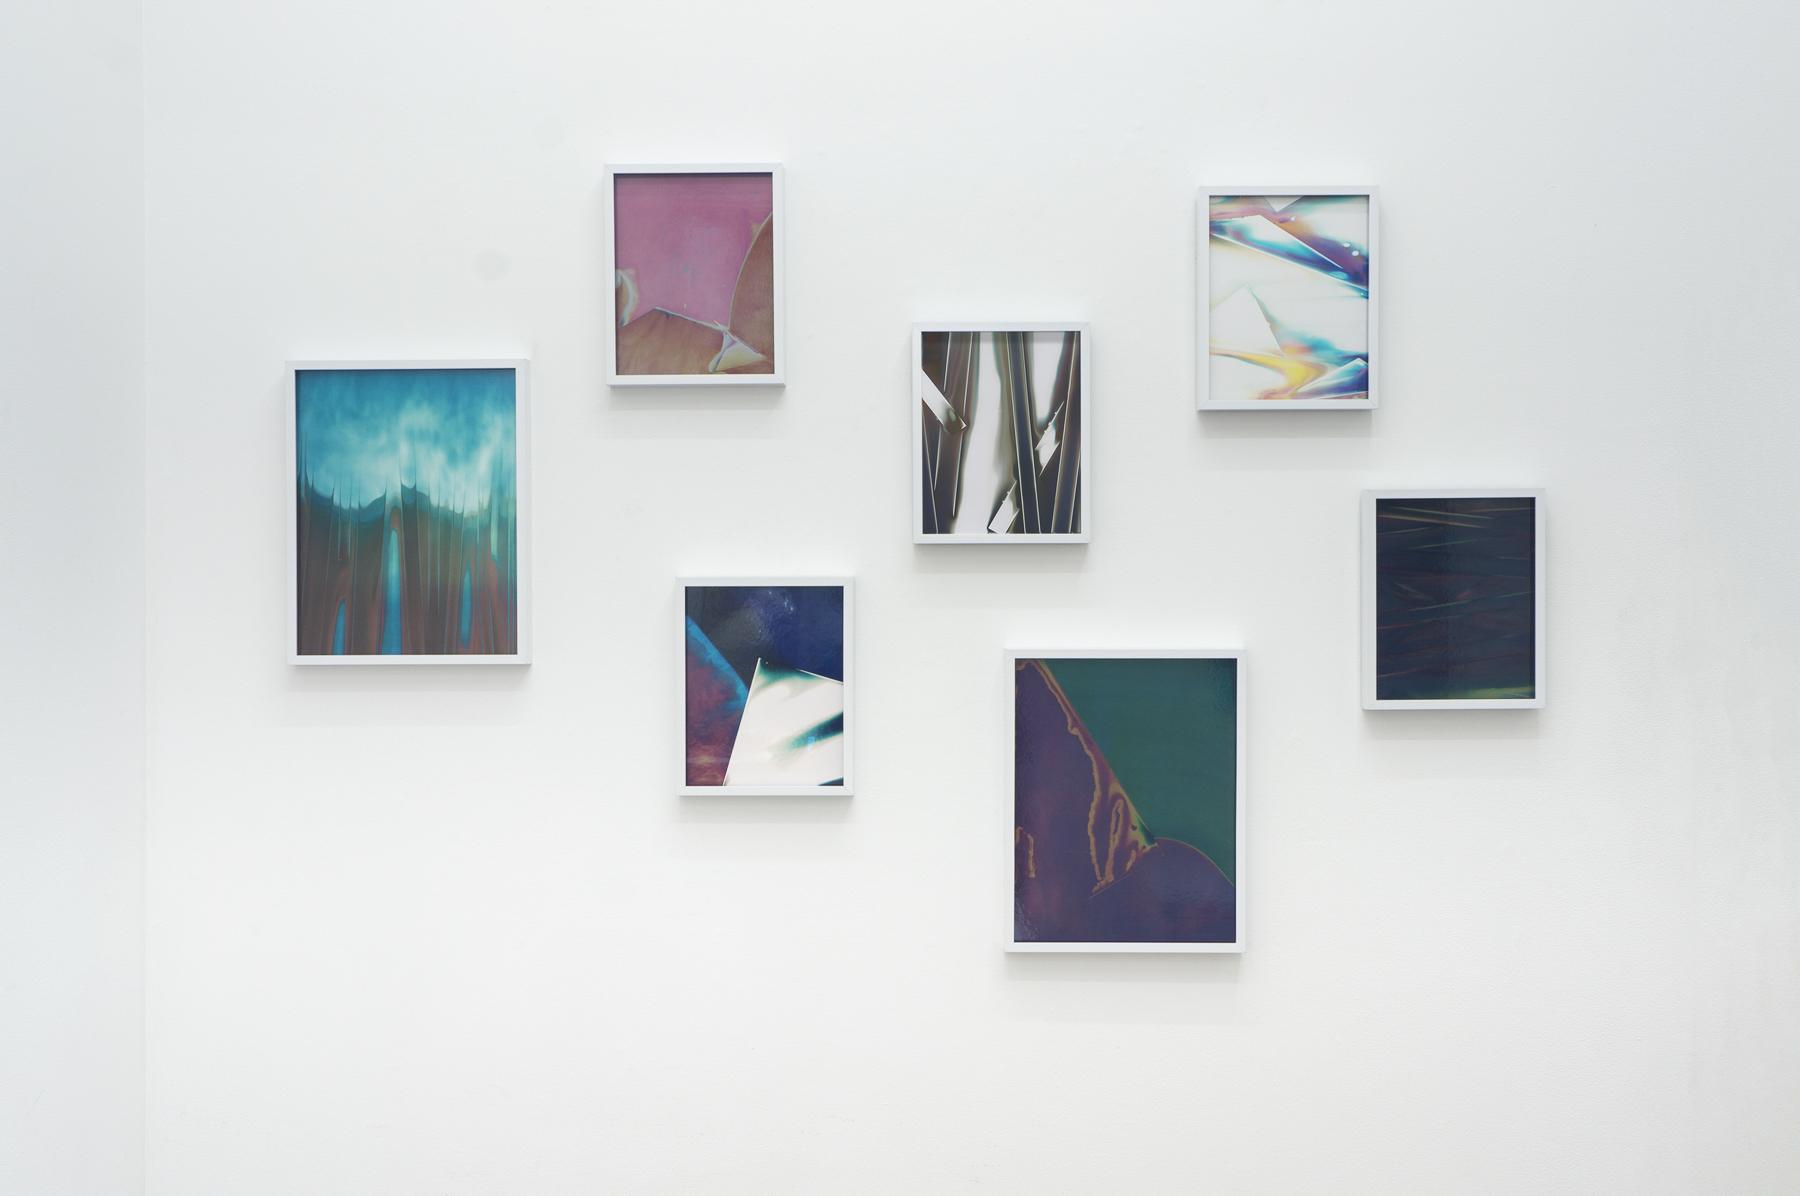 No Poetic Device Installation - Denny Gallery New York